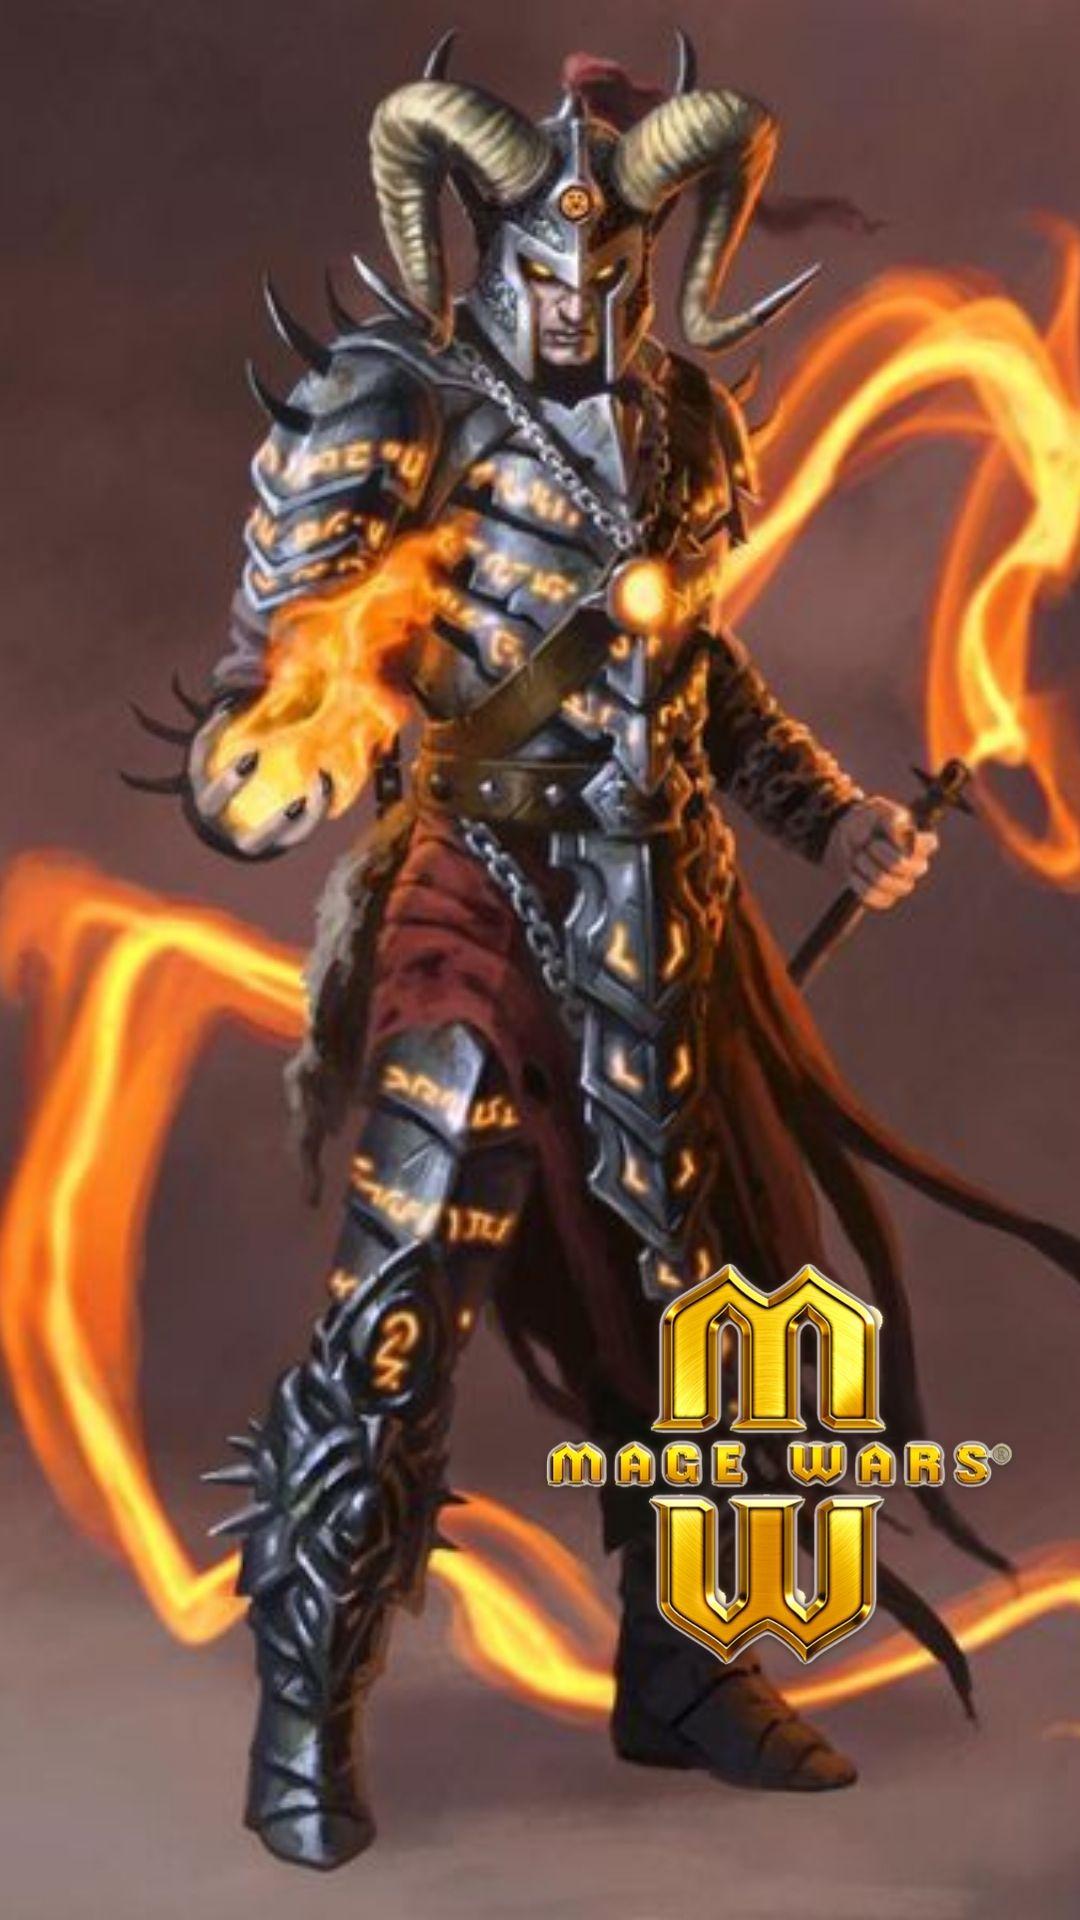 https://www.gamekastle.com/online/images/uploads/MageWars2_Mo.jpg